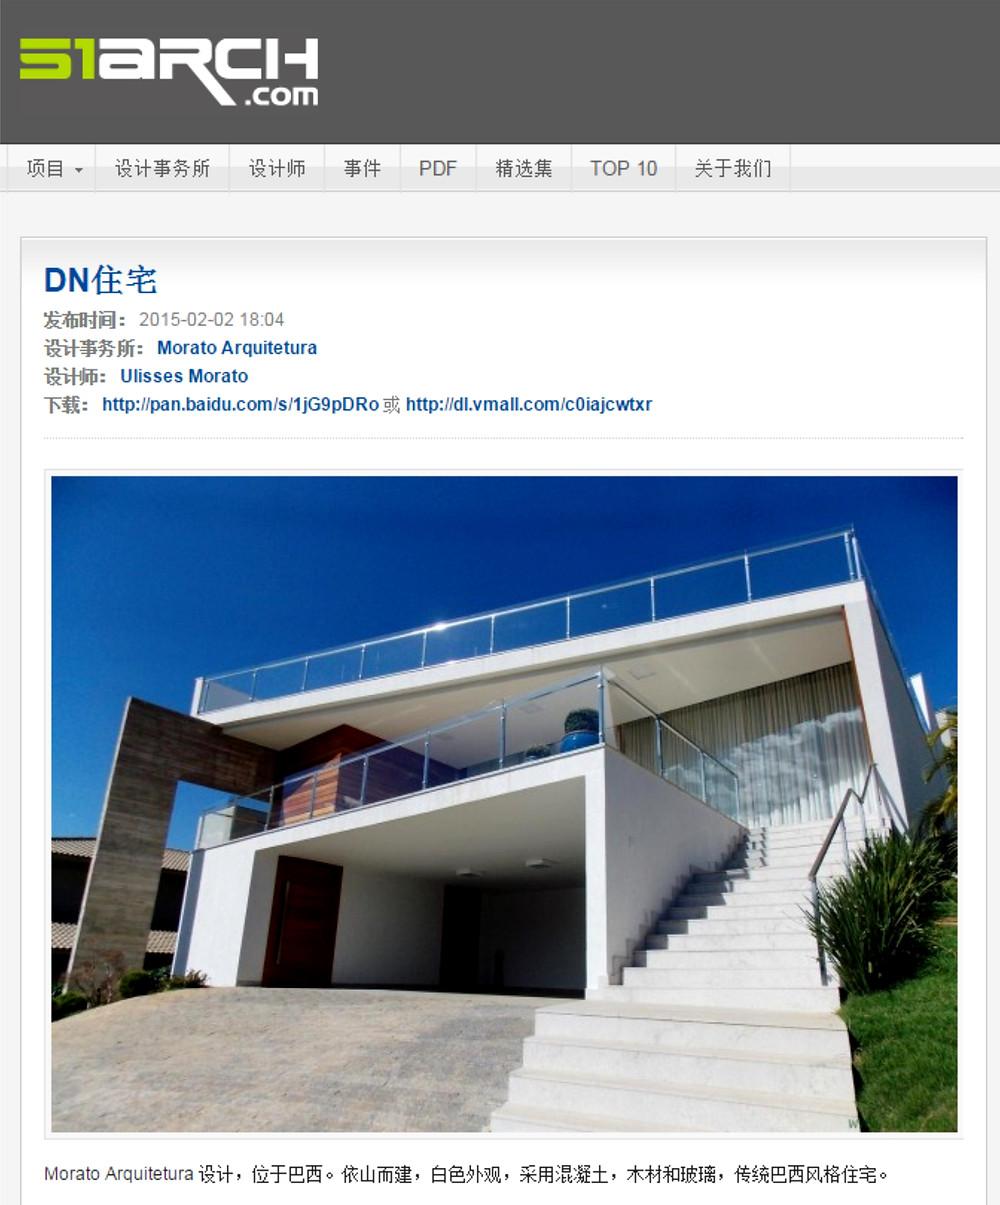 Casa EP no 51ARCH   Morato Arquitetura